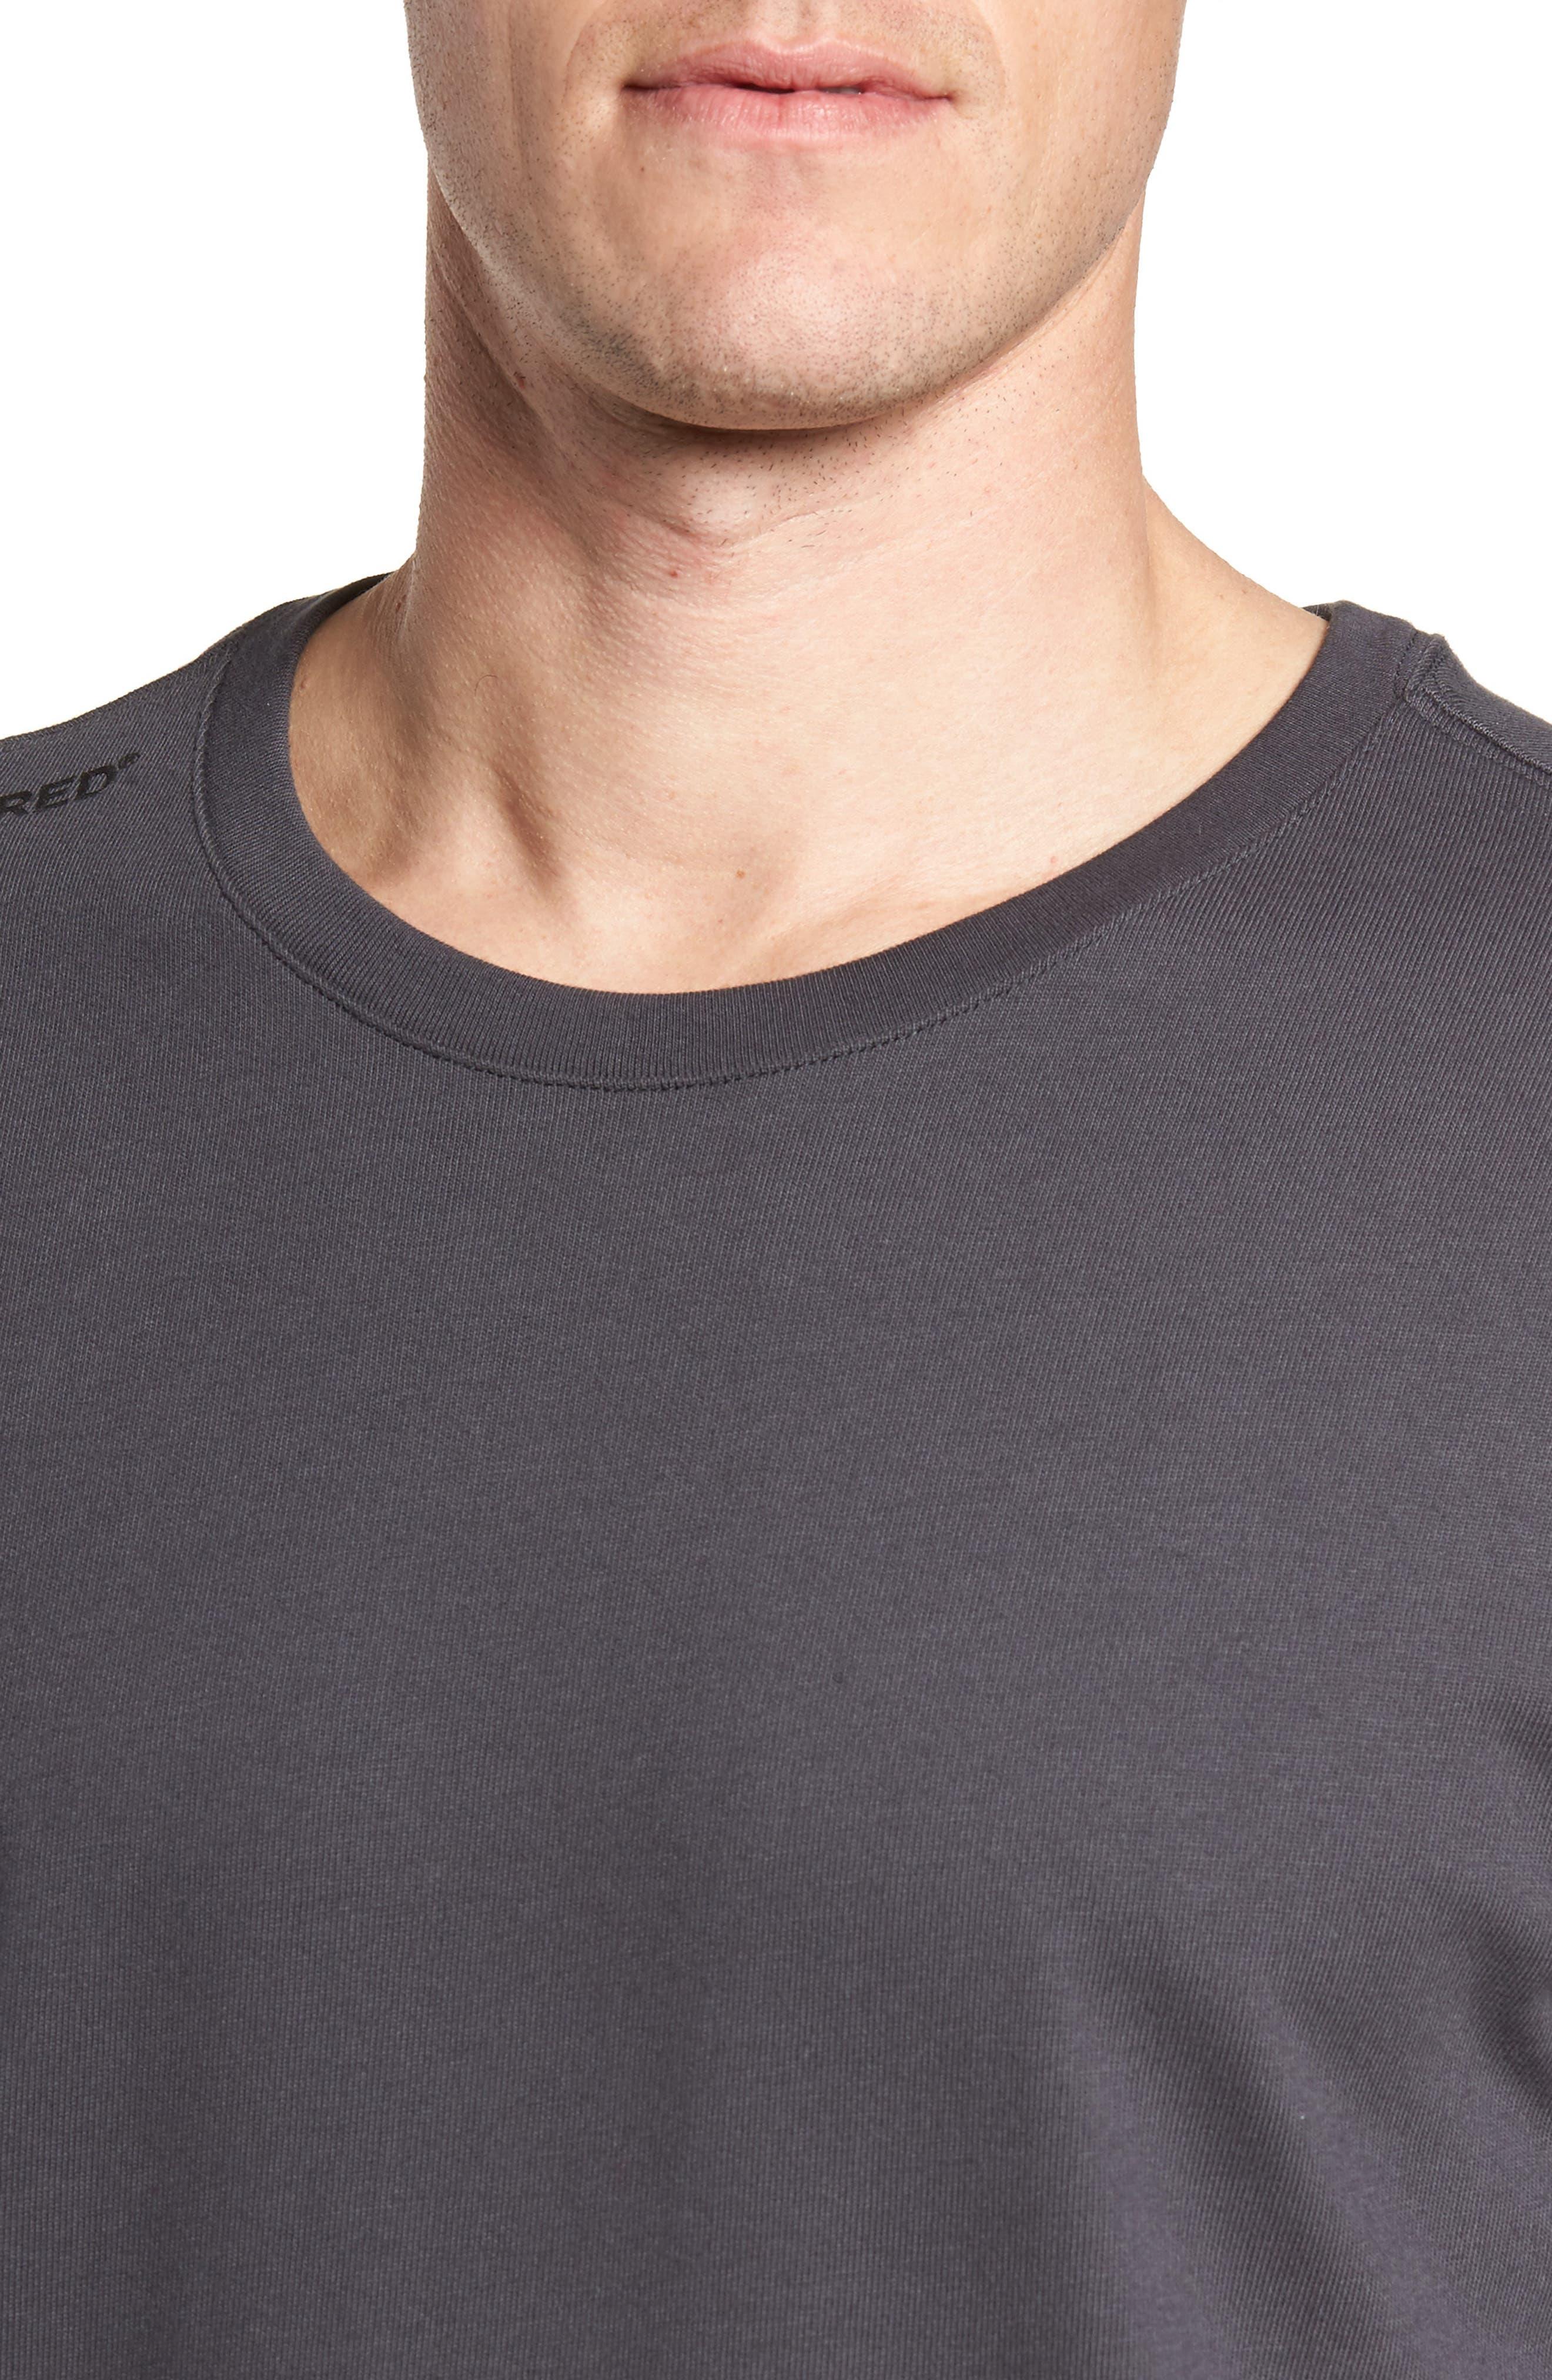 Sportswear 23 Engineered T-Shirt,                             Alternate thumbnail 7, color,